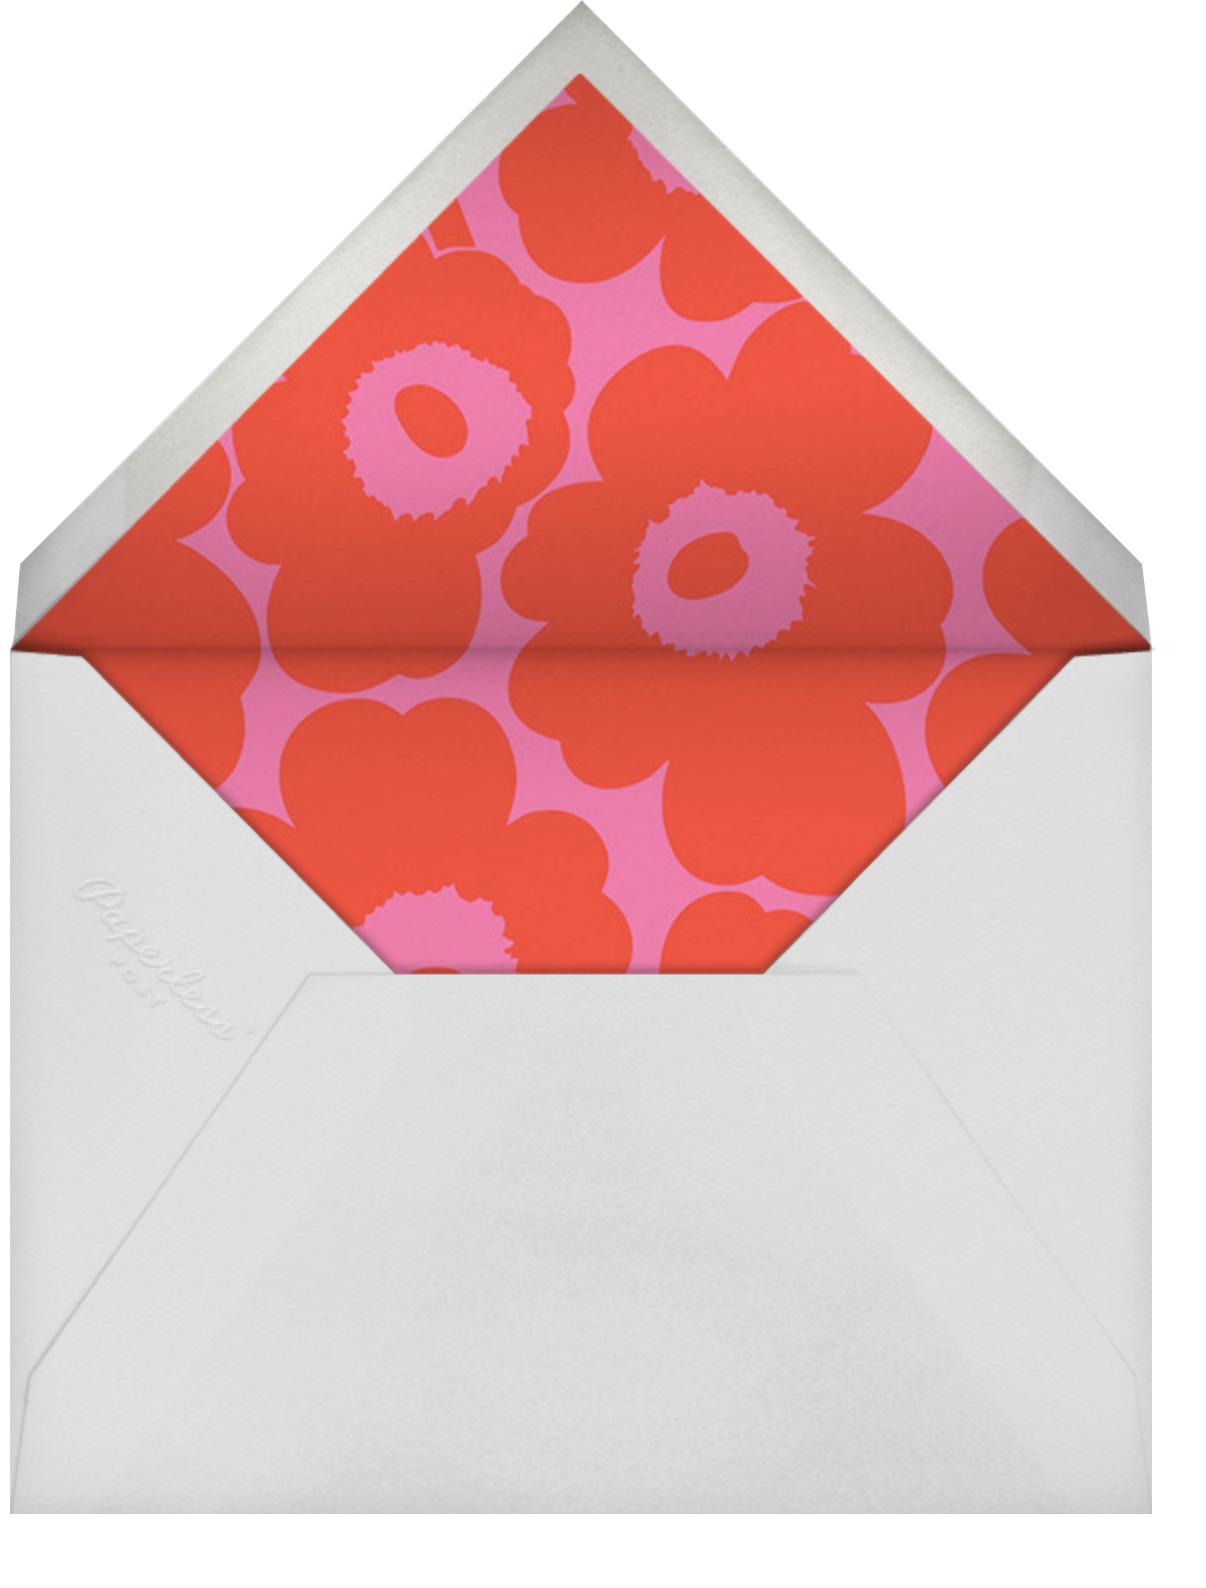 Unikko (Square) - Red/Pink - Marimekko - Valentine's Day - envelope back